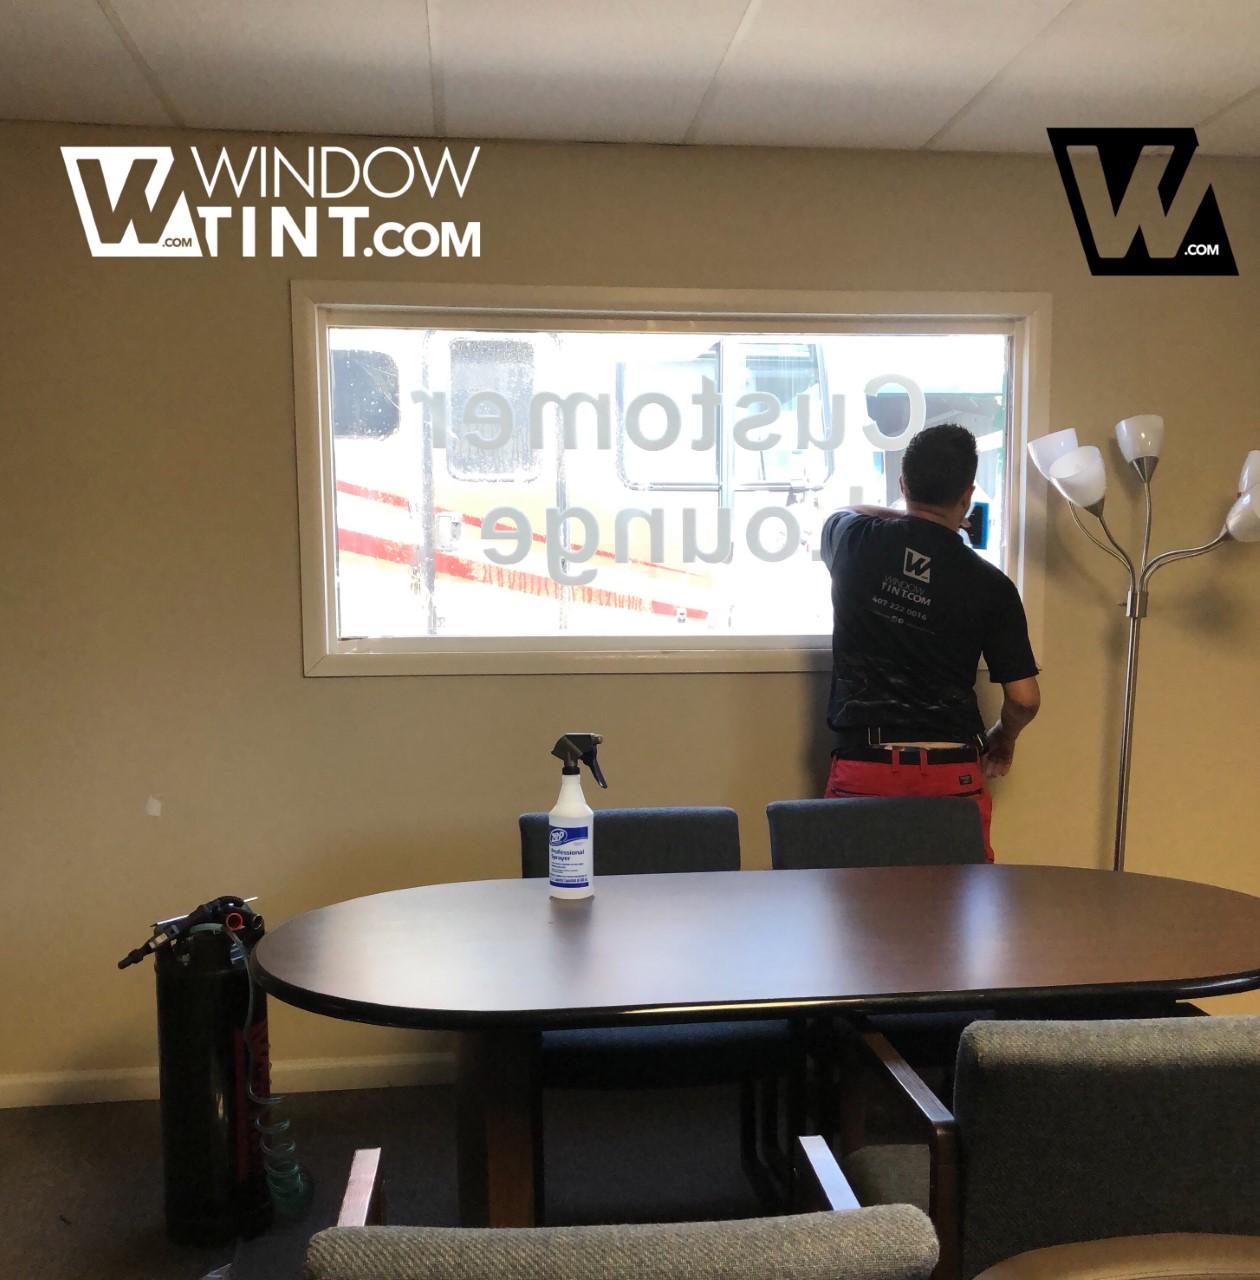 Window Tint.com